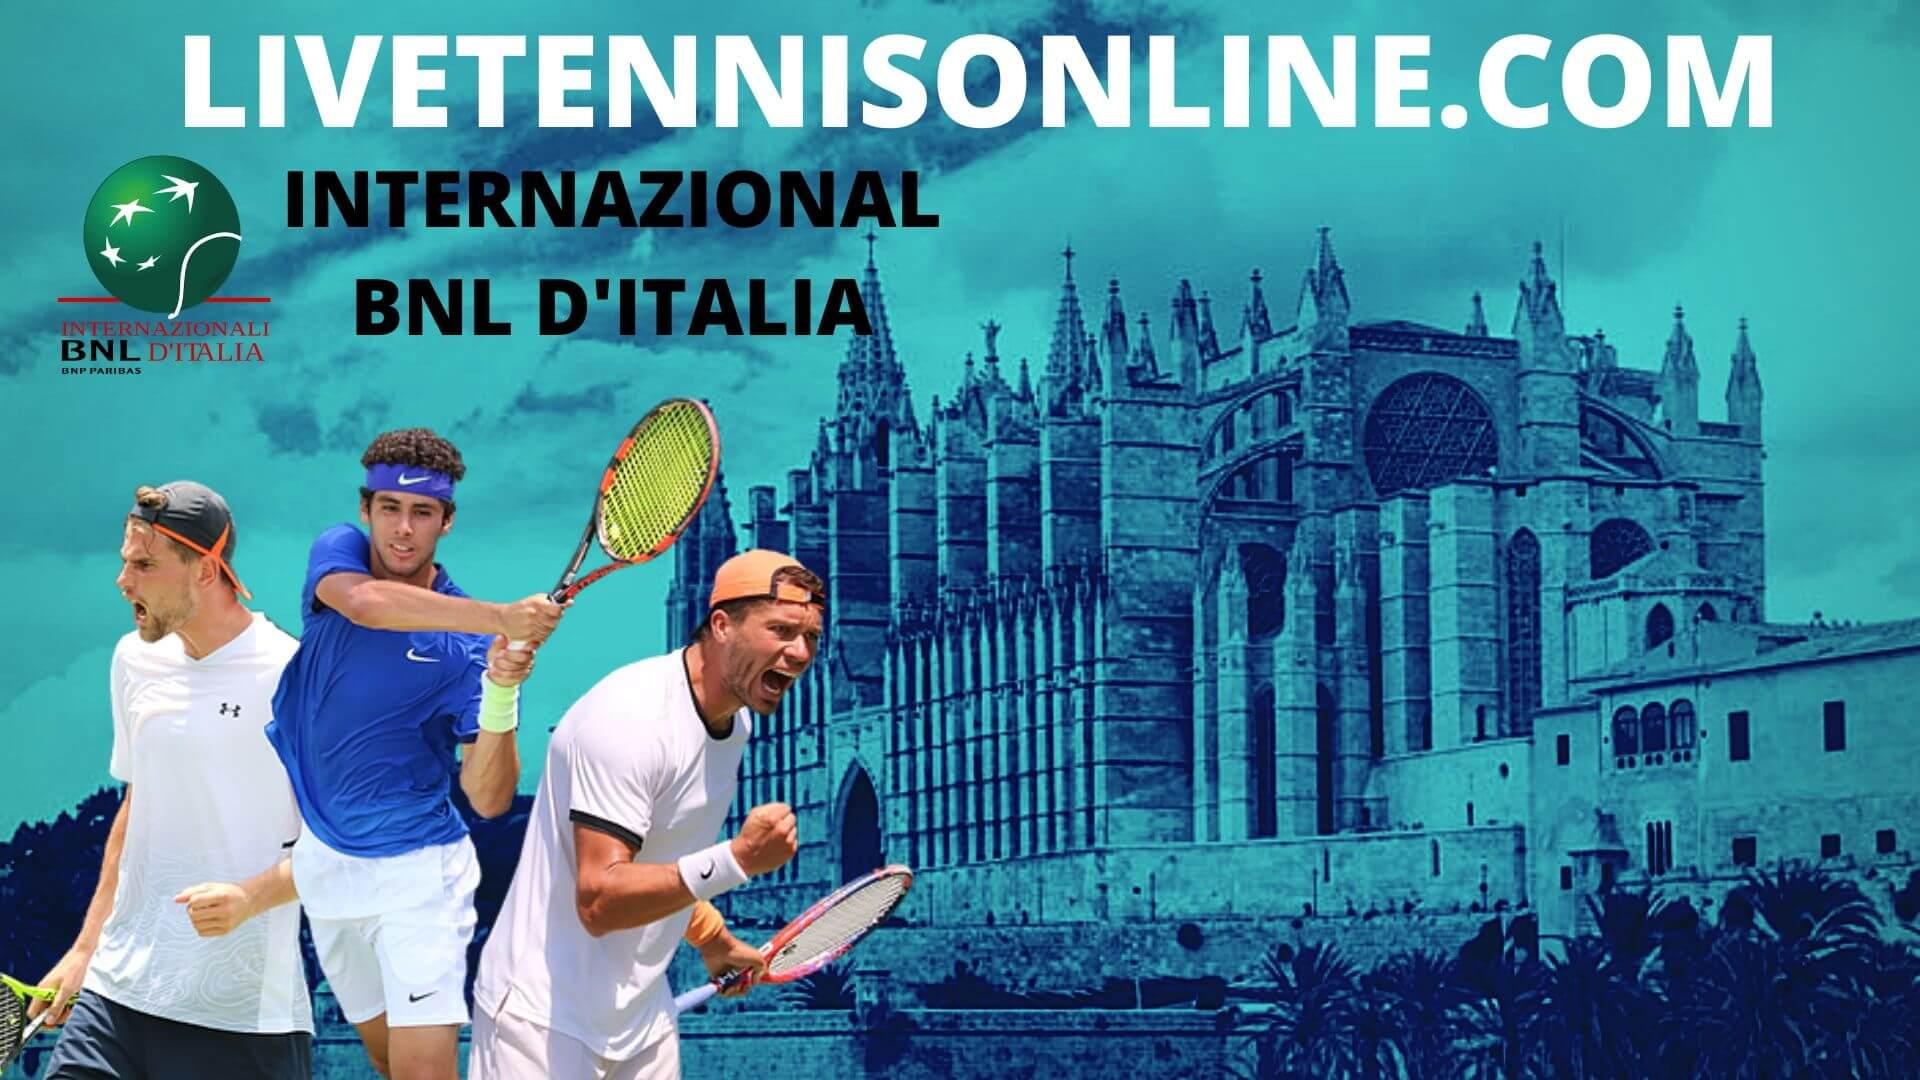 Internazionali BNL d Italia Live Stream 2020 | Final